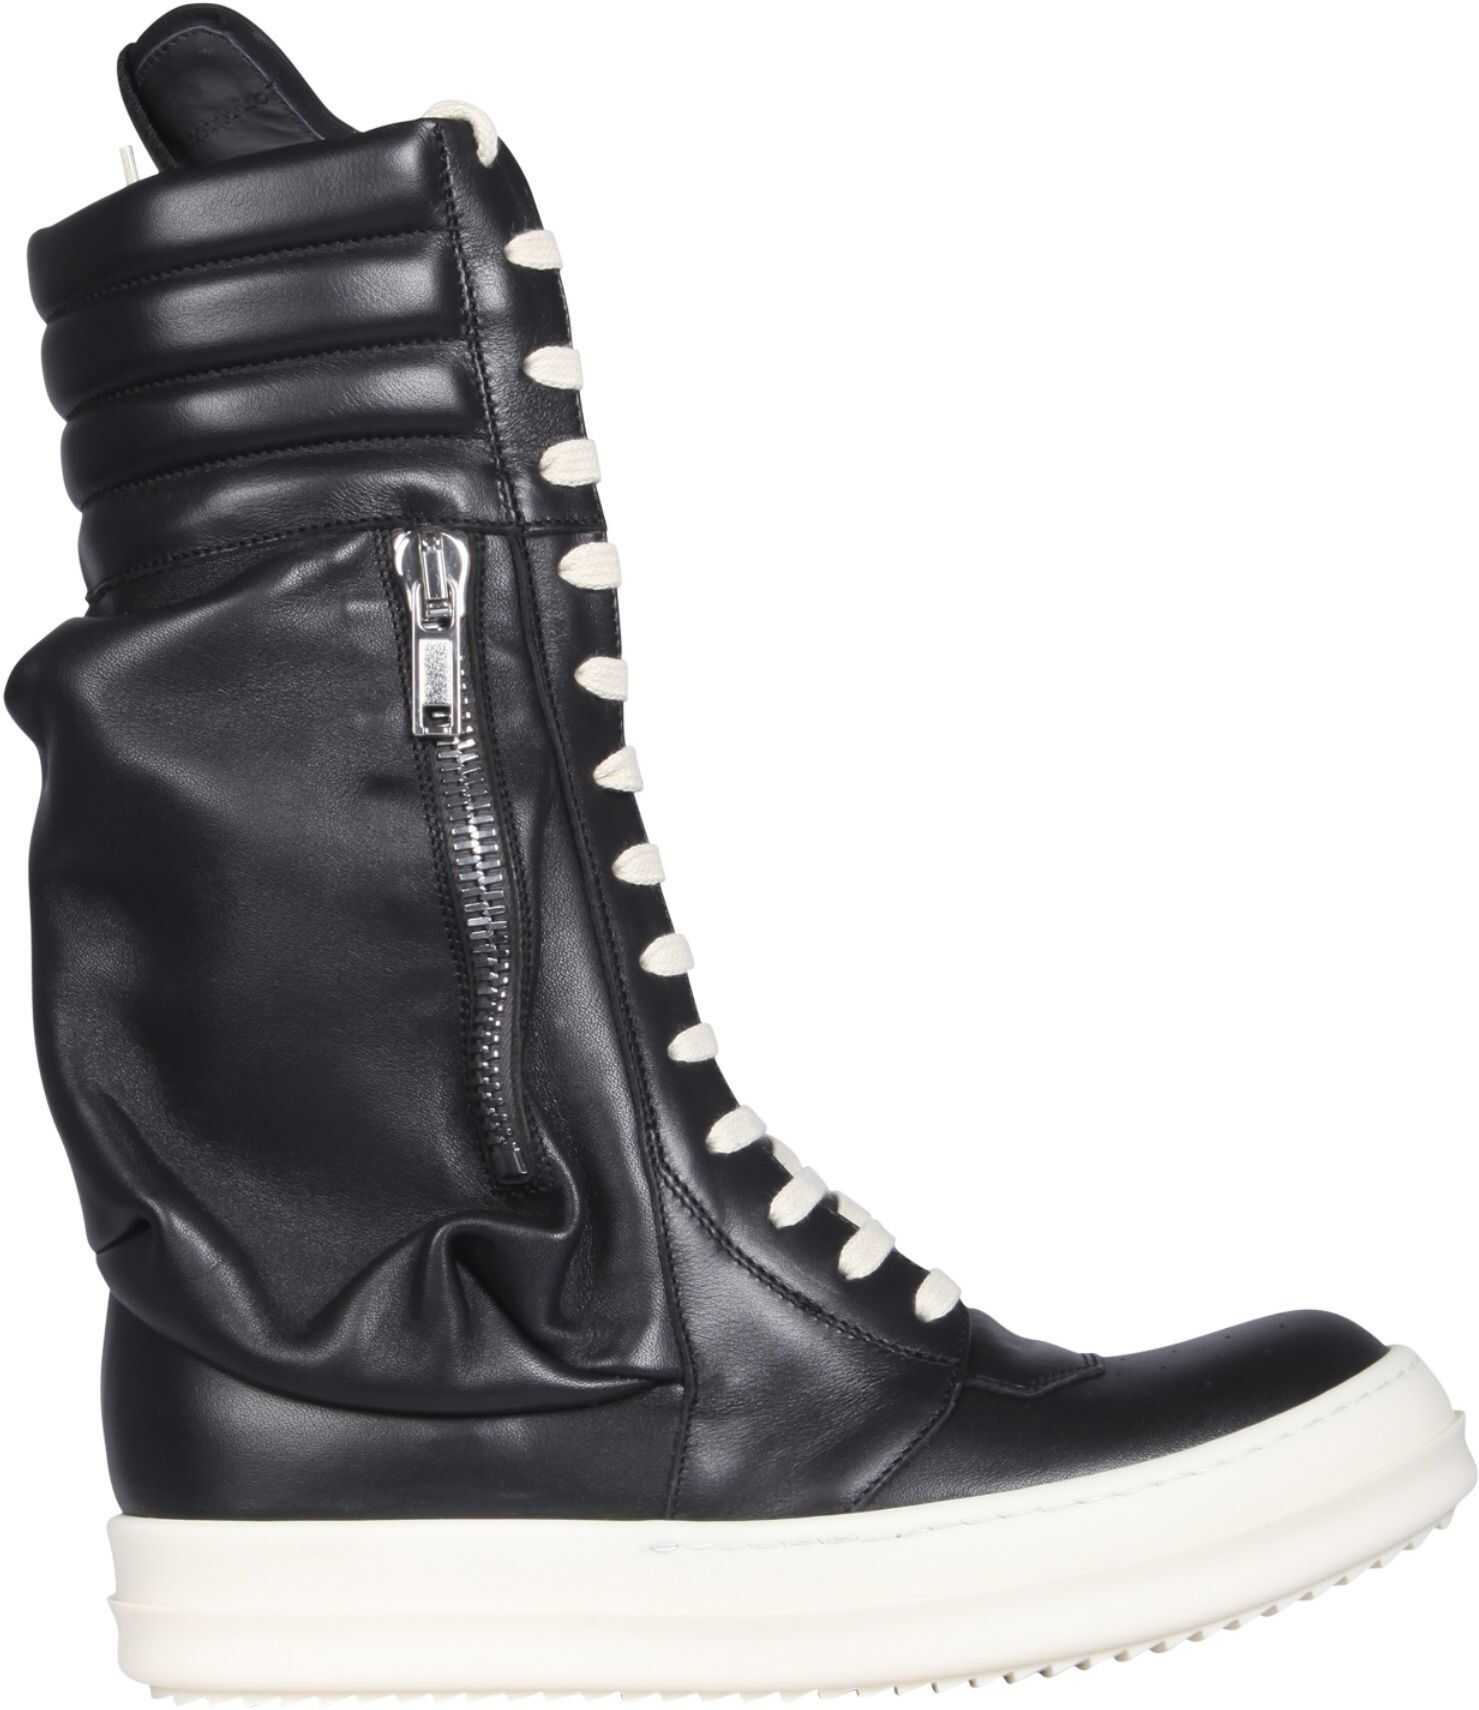 Rick Owens Cargo Basketball Boots RO21S3899_LPO911 BLACK imagine b-mall.ro